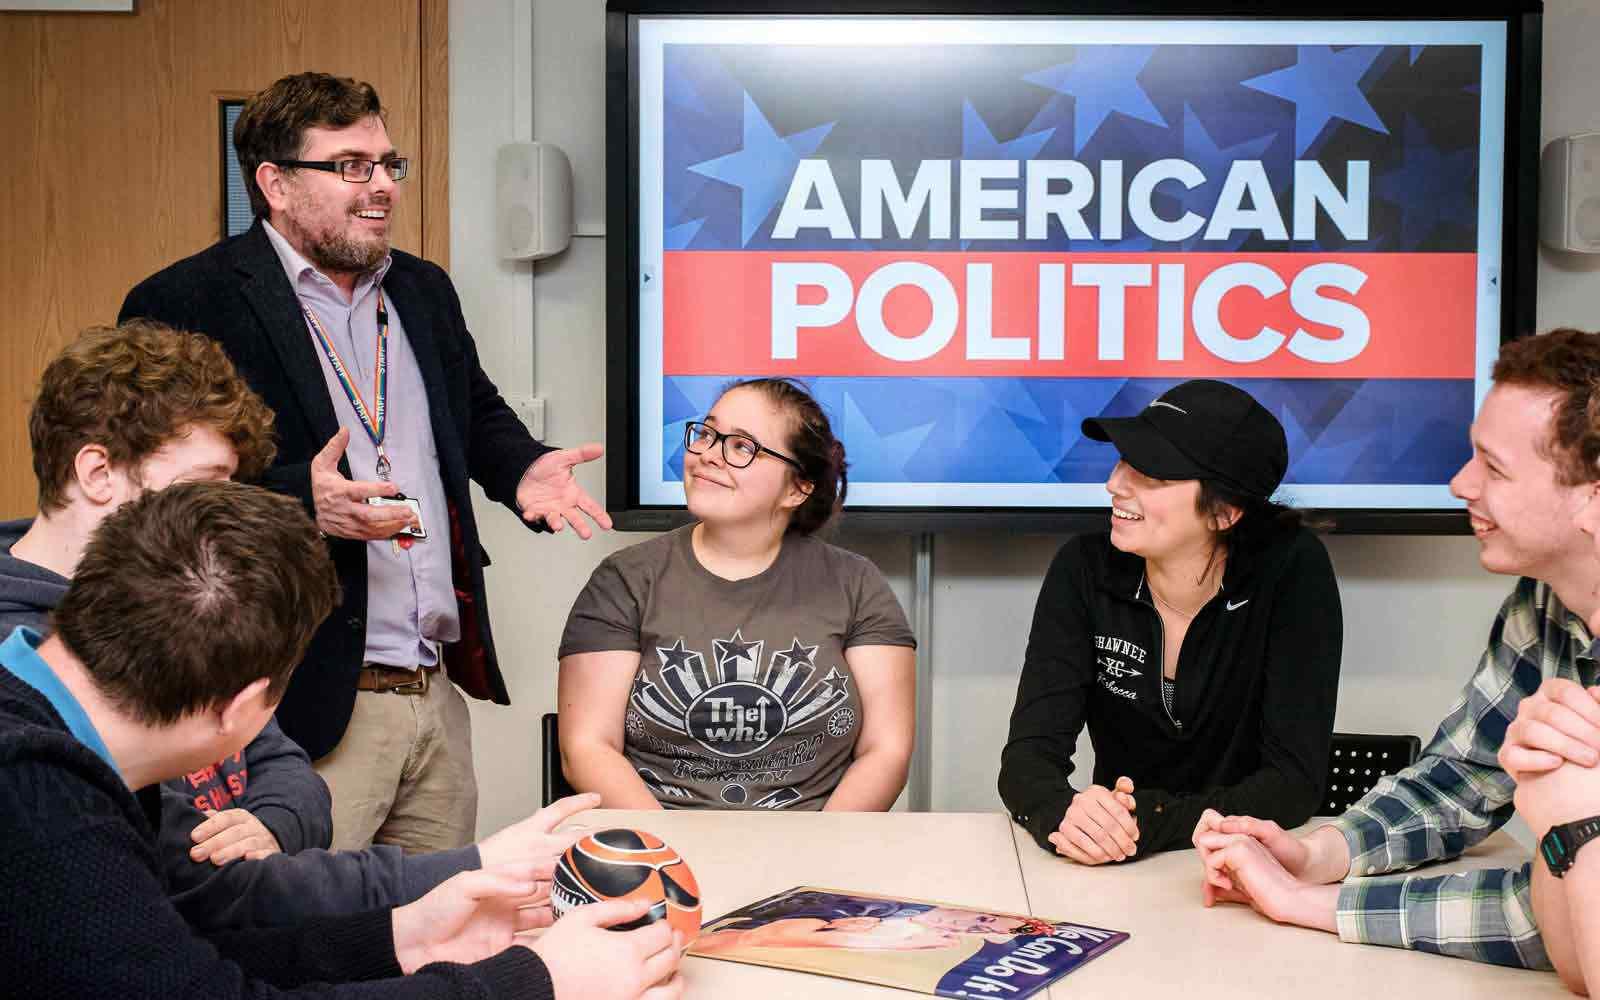 Students discussing american politics in seminar